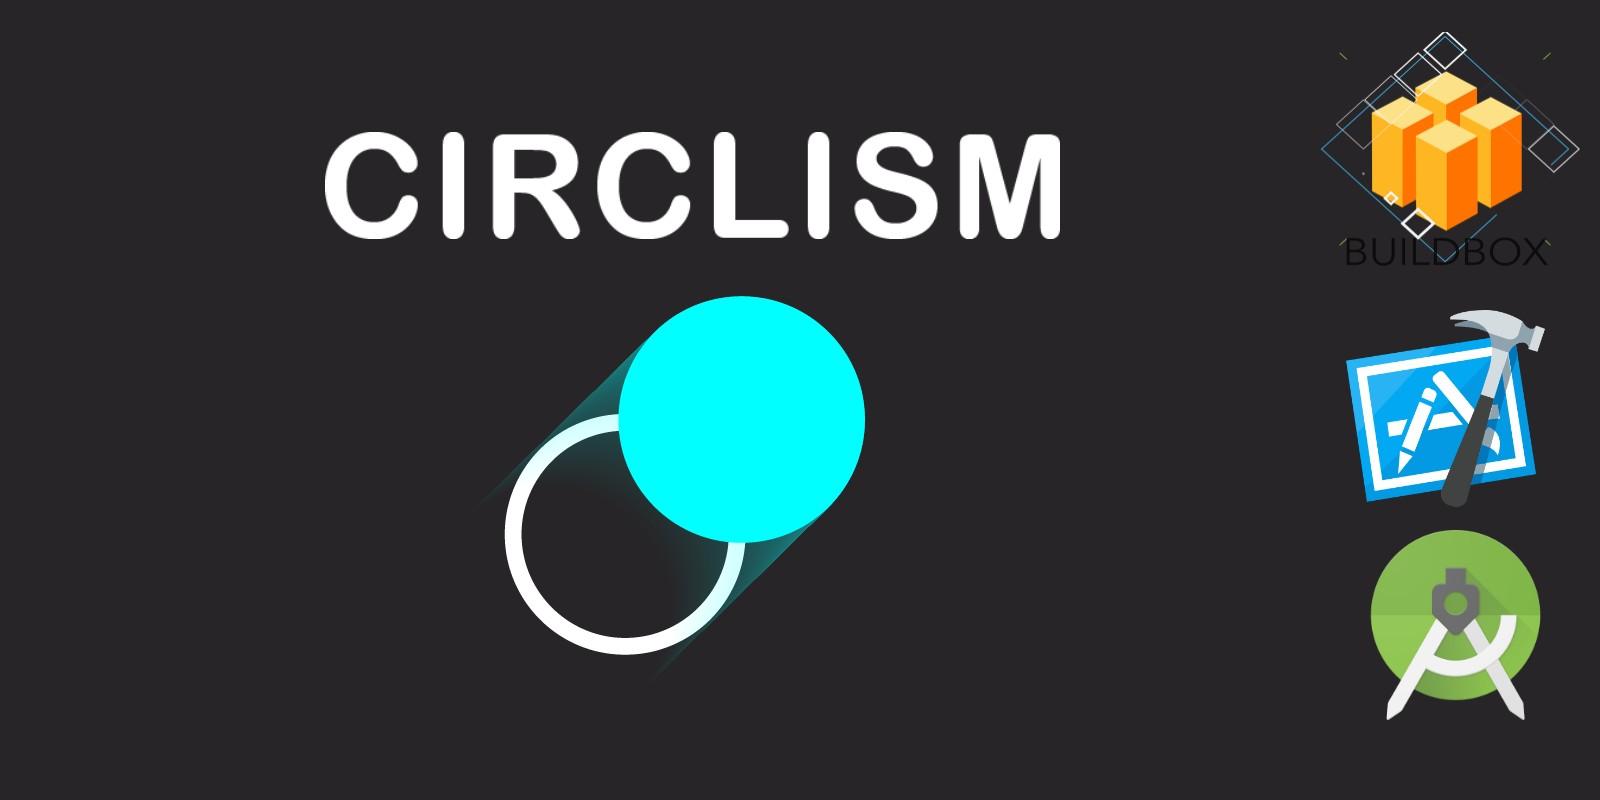 Circlism Buildbox Template